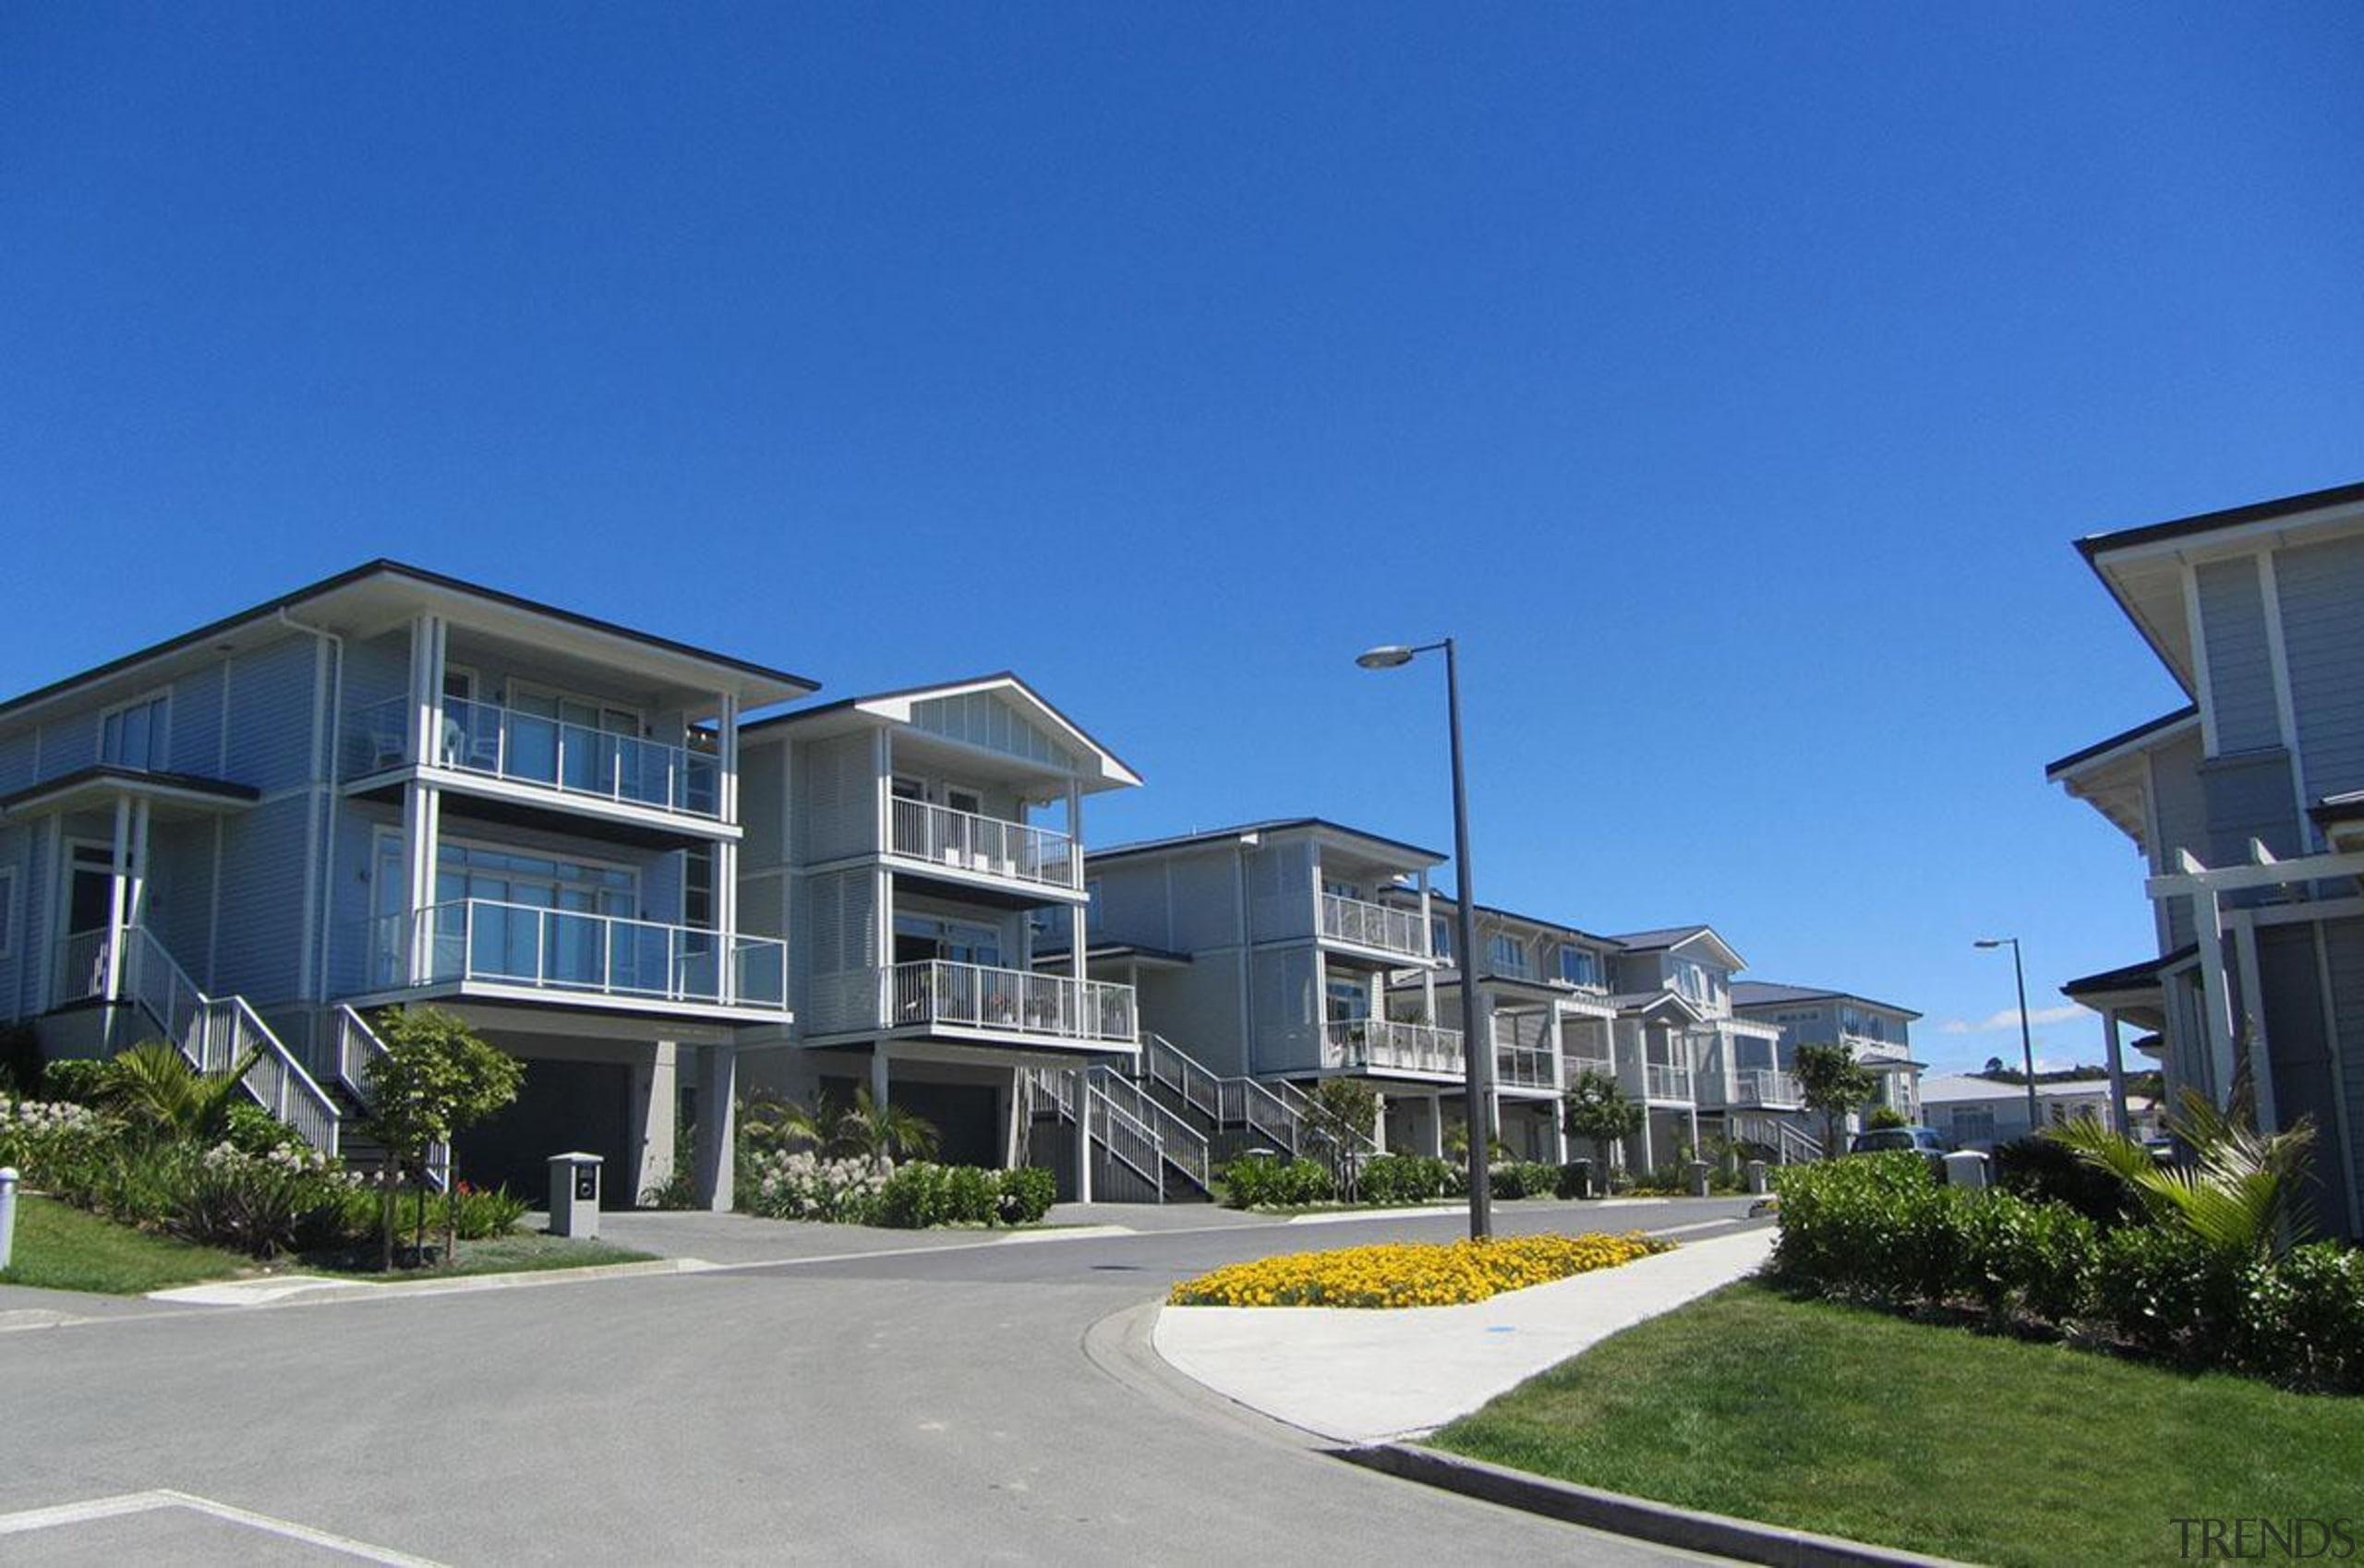 NOMINEEKensington Park (2 of 4) - Arrow International apartment, building, condominium, corporate headquarters, estate, home, house, metropolitan area, mixed use, neighbourhood, property, real estate, residential area, sky, suburb, blue